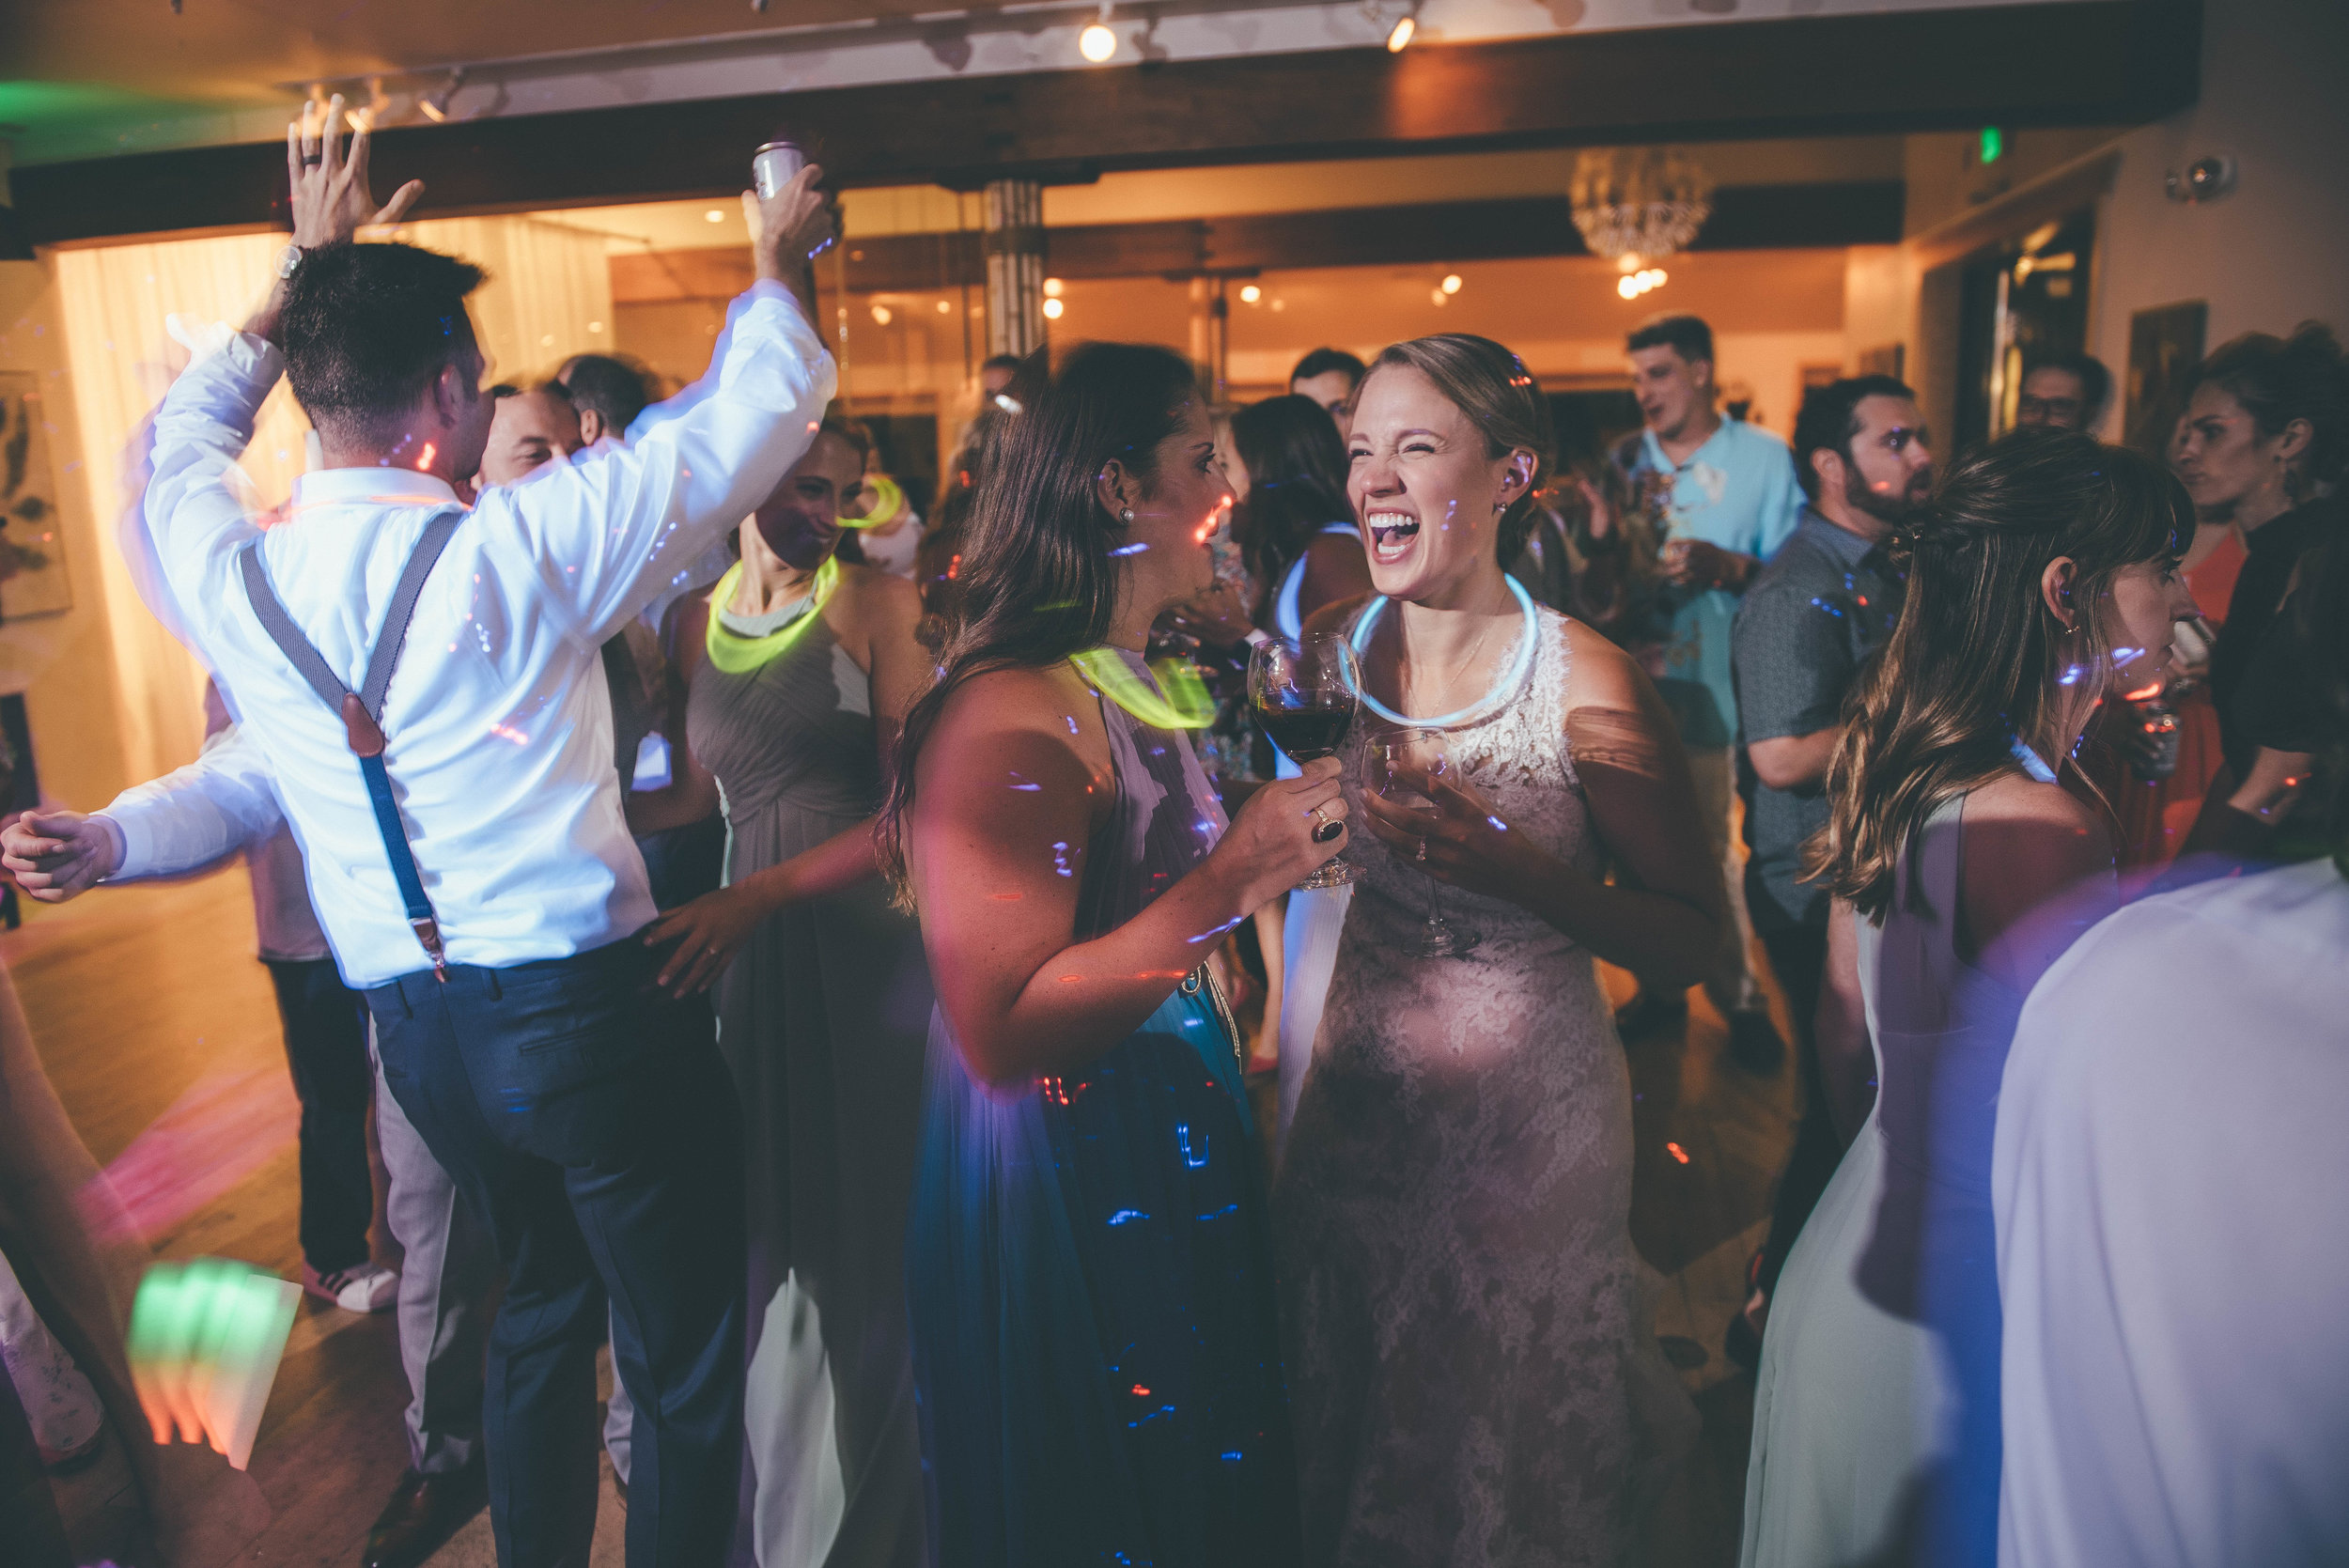 ChadFahnestockPhotography-mc-wedding-028.jpg